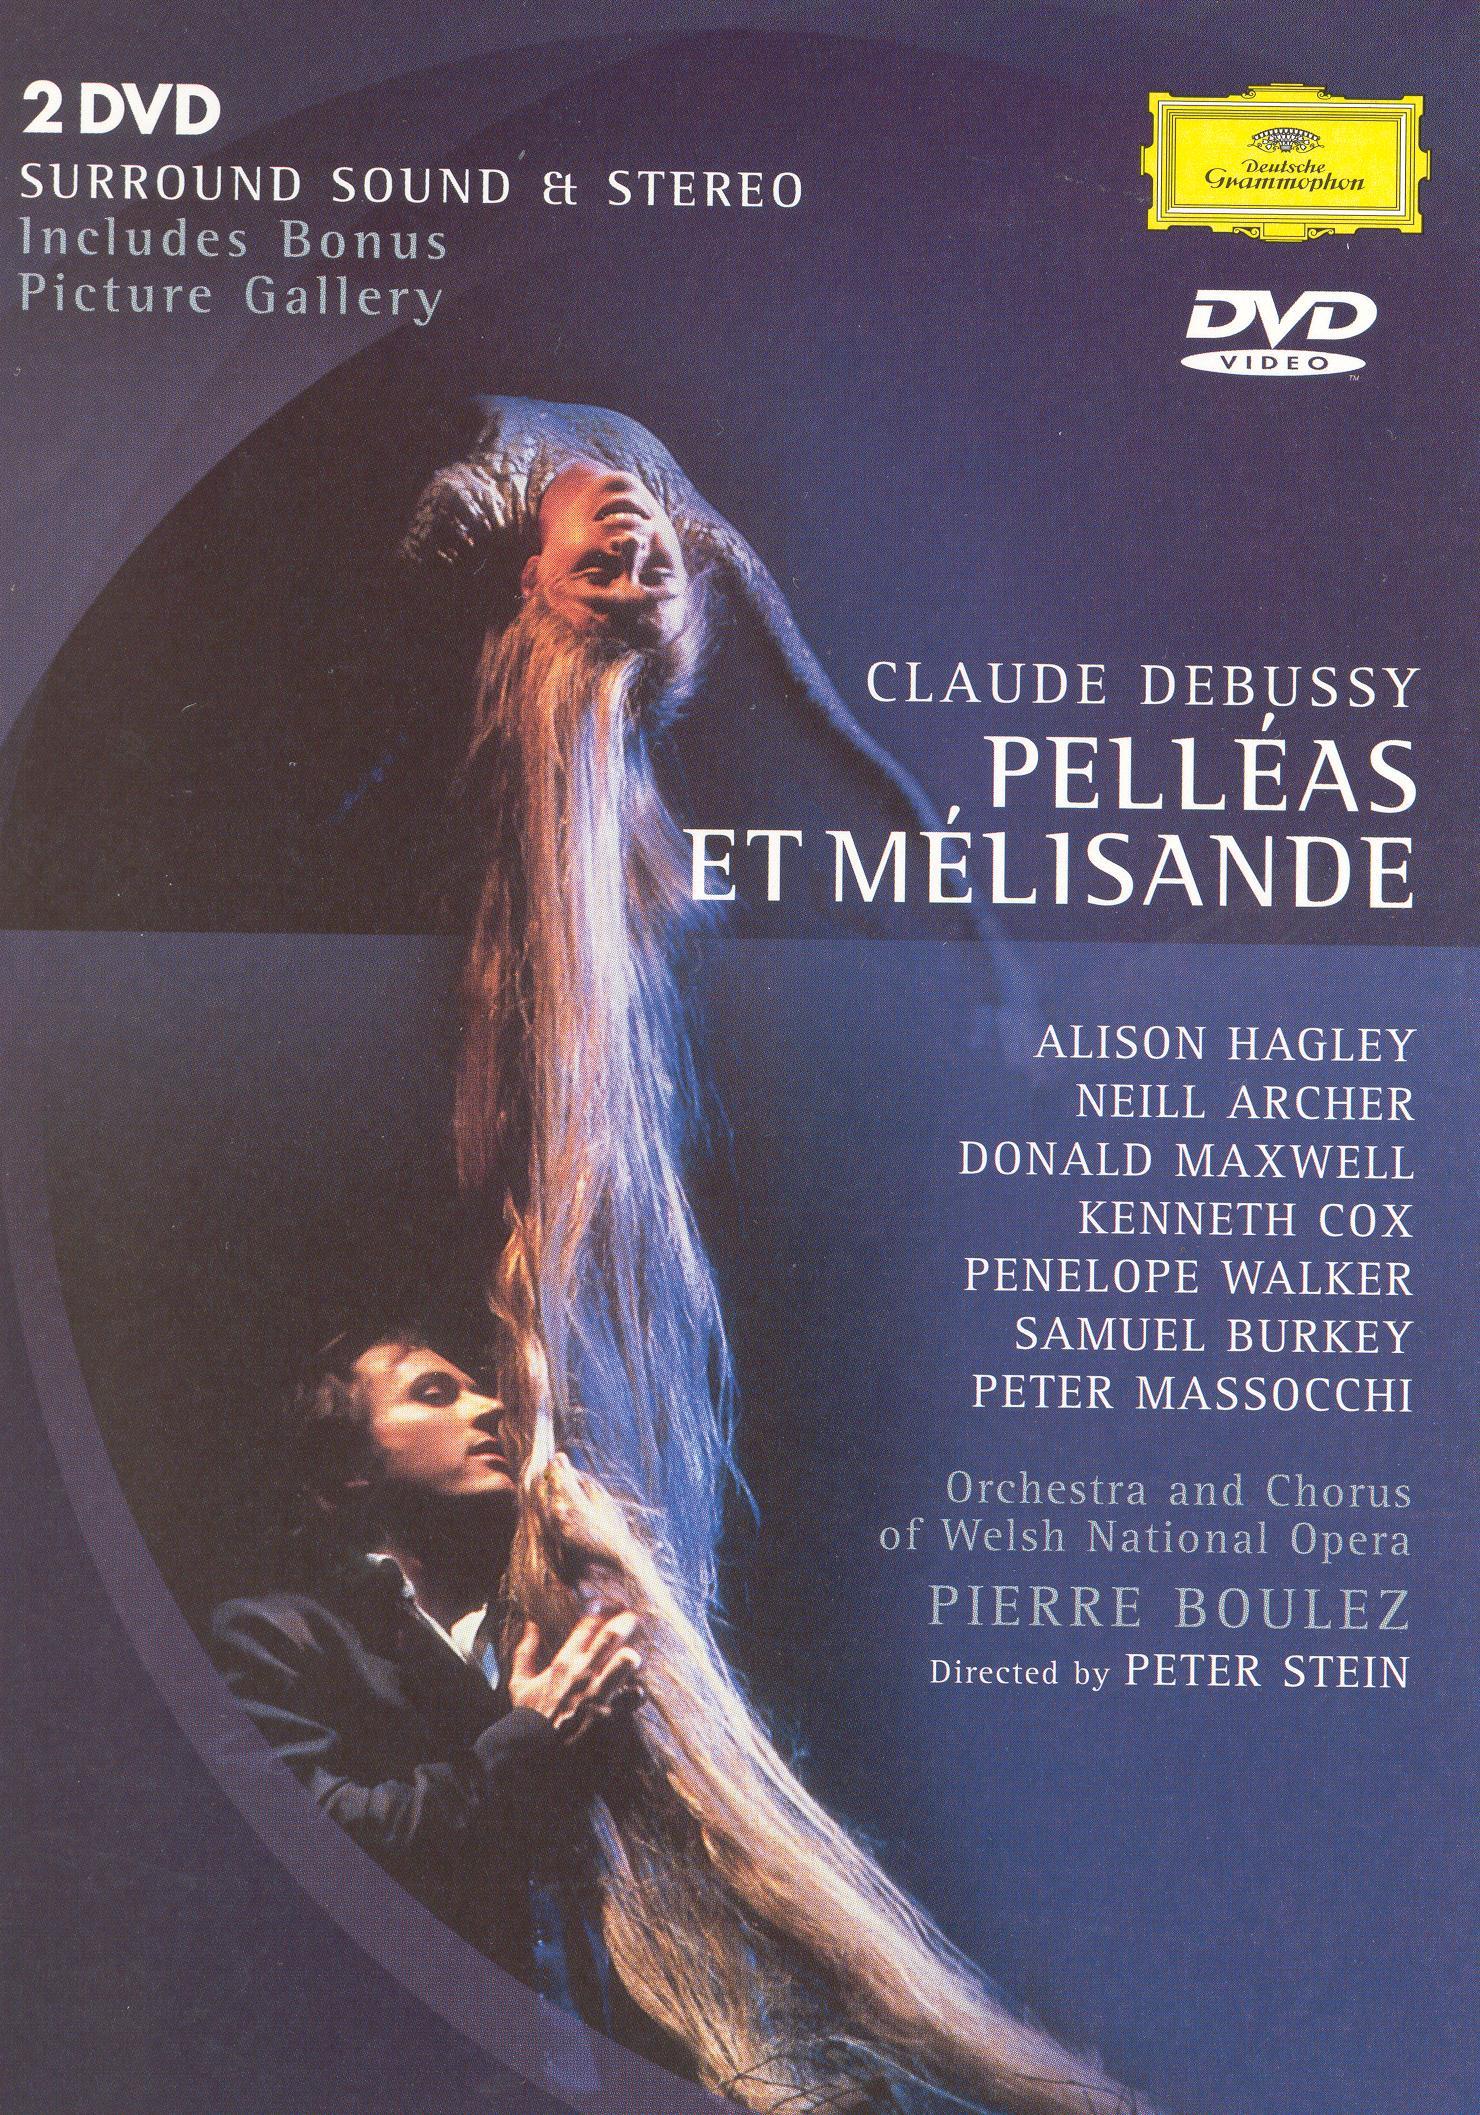 Pelléas et Mélisande (Welsh National Opera)